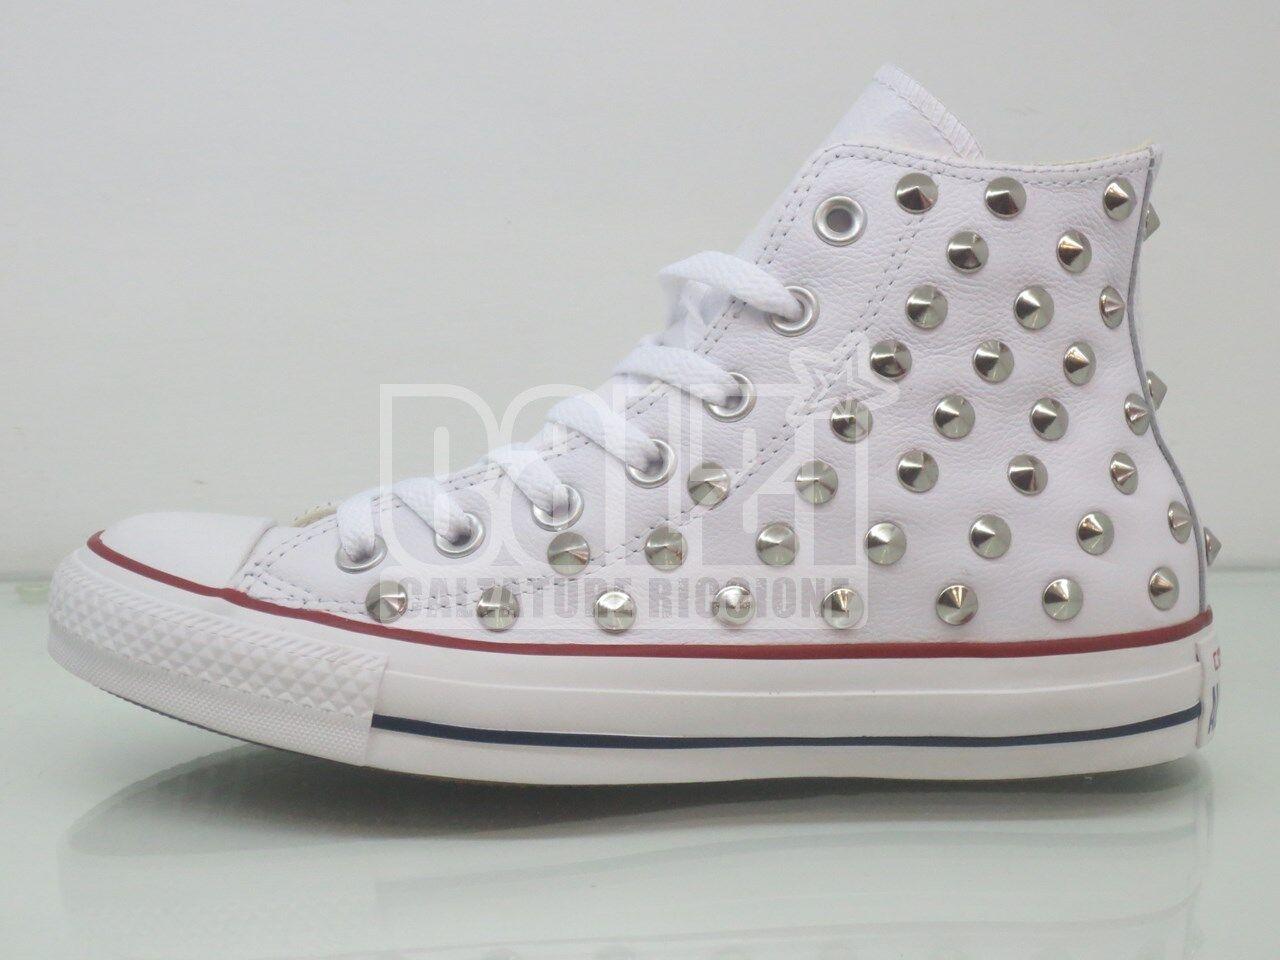 Converse Converse PELLE all star Hi bianco Pelle PELLE Converse Converse scarpe   4c1ad7